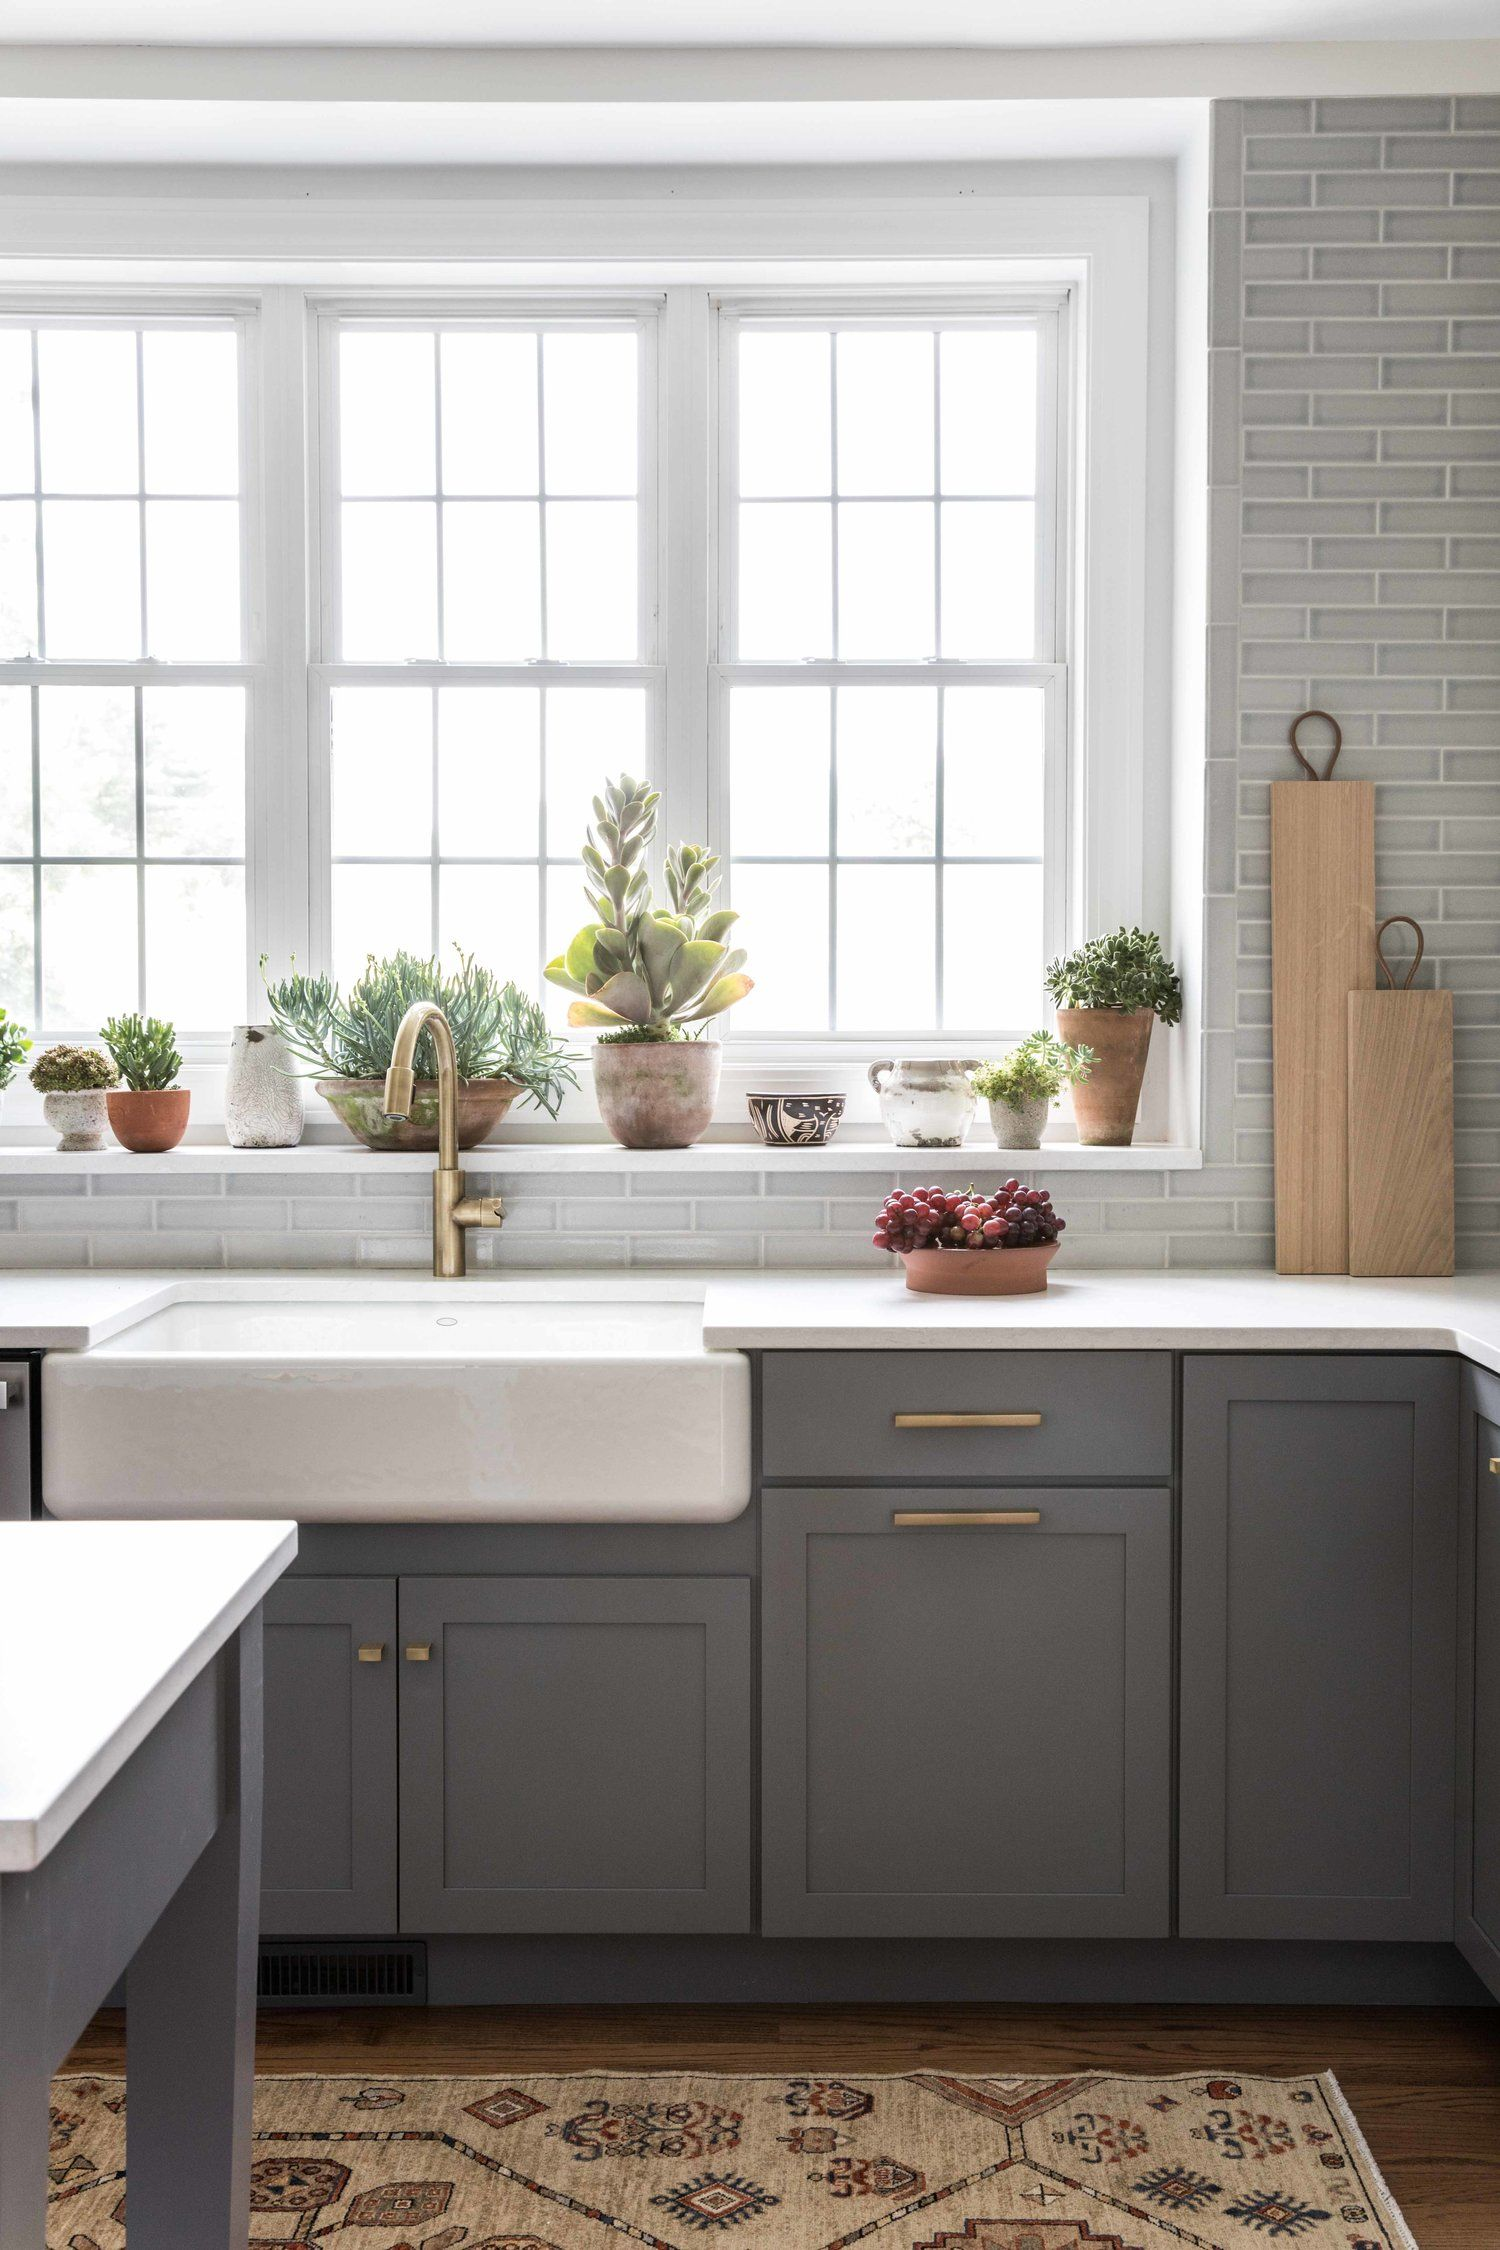 Portsmouth New Hampshire Kitchen Sink Jpg In 2020 New England Kitchen Classic Backsplash Kitchen Design